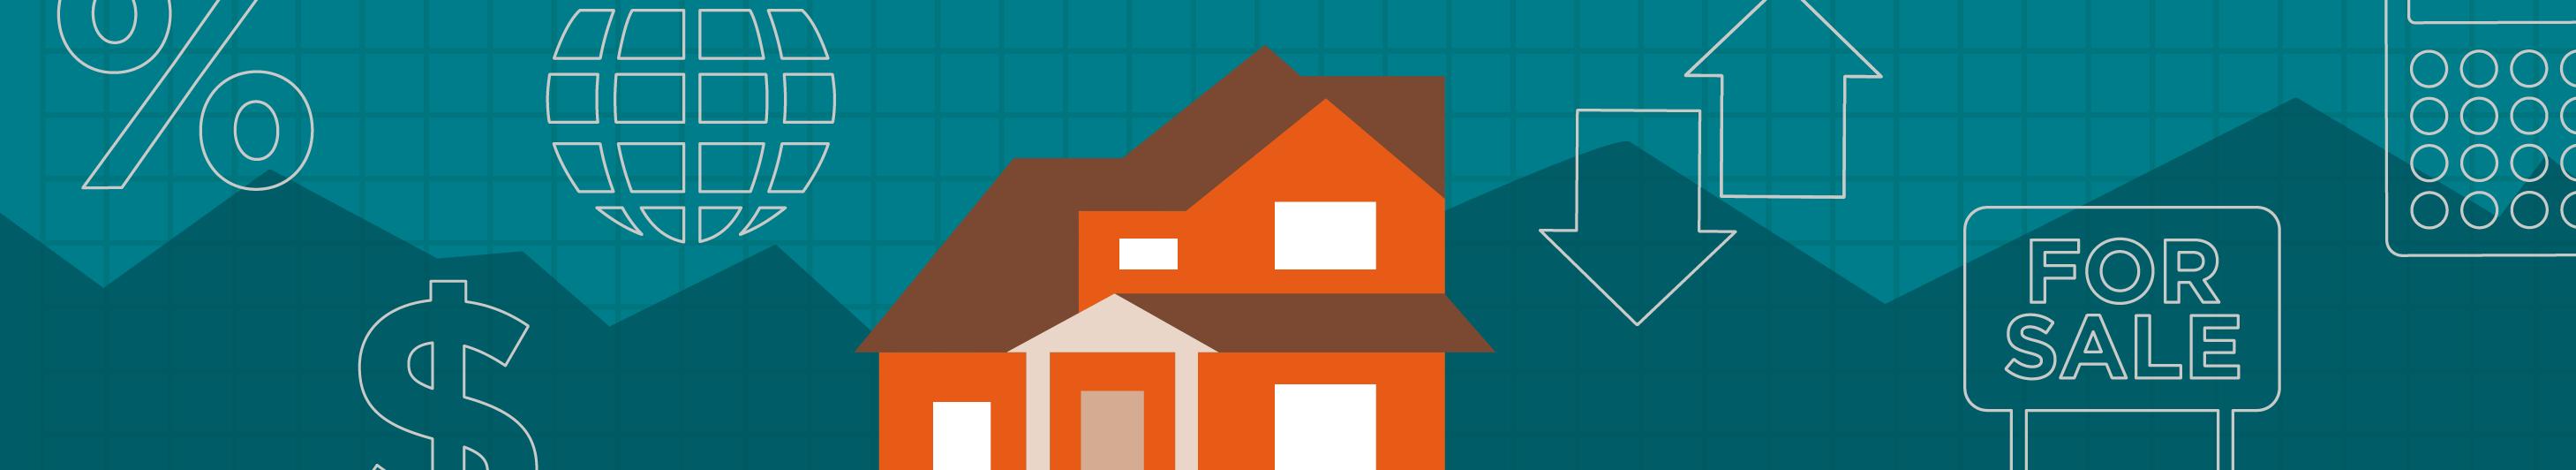 illustration of an orange house